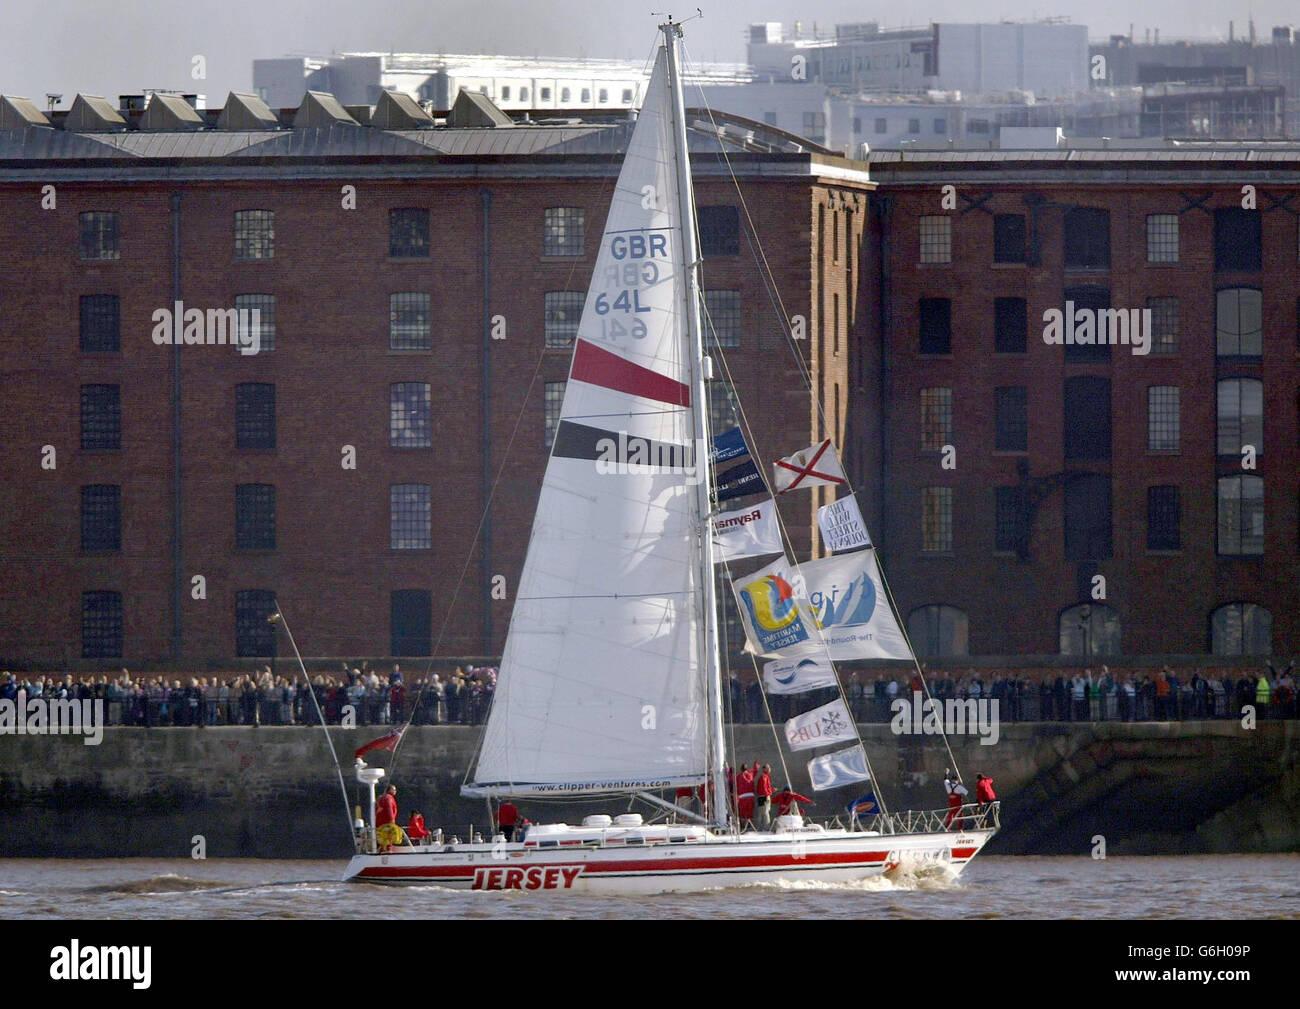 Round The World Yacht Race - Stock Image